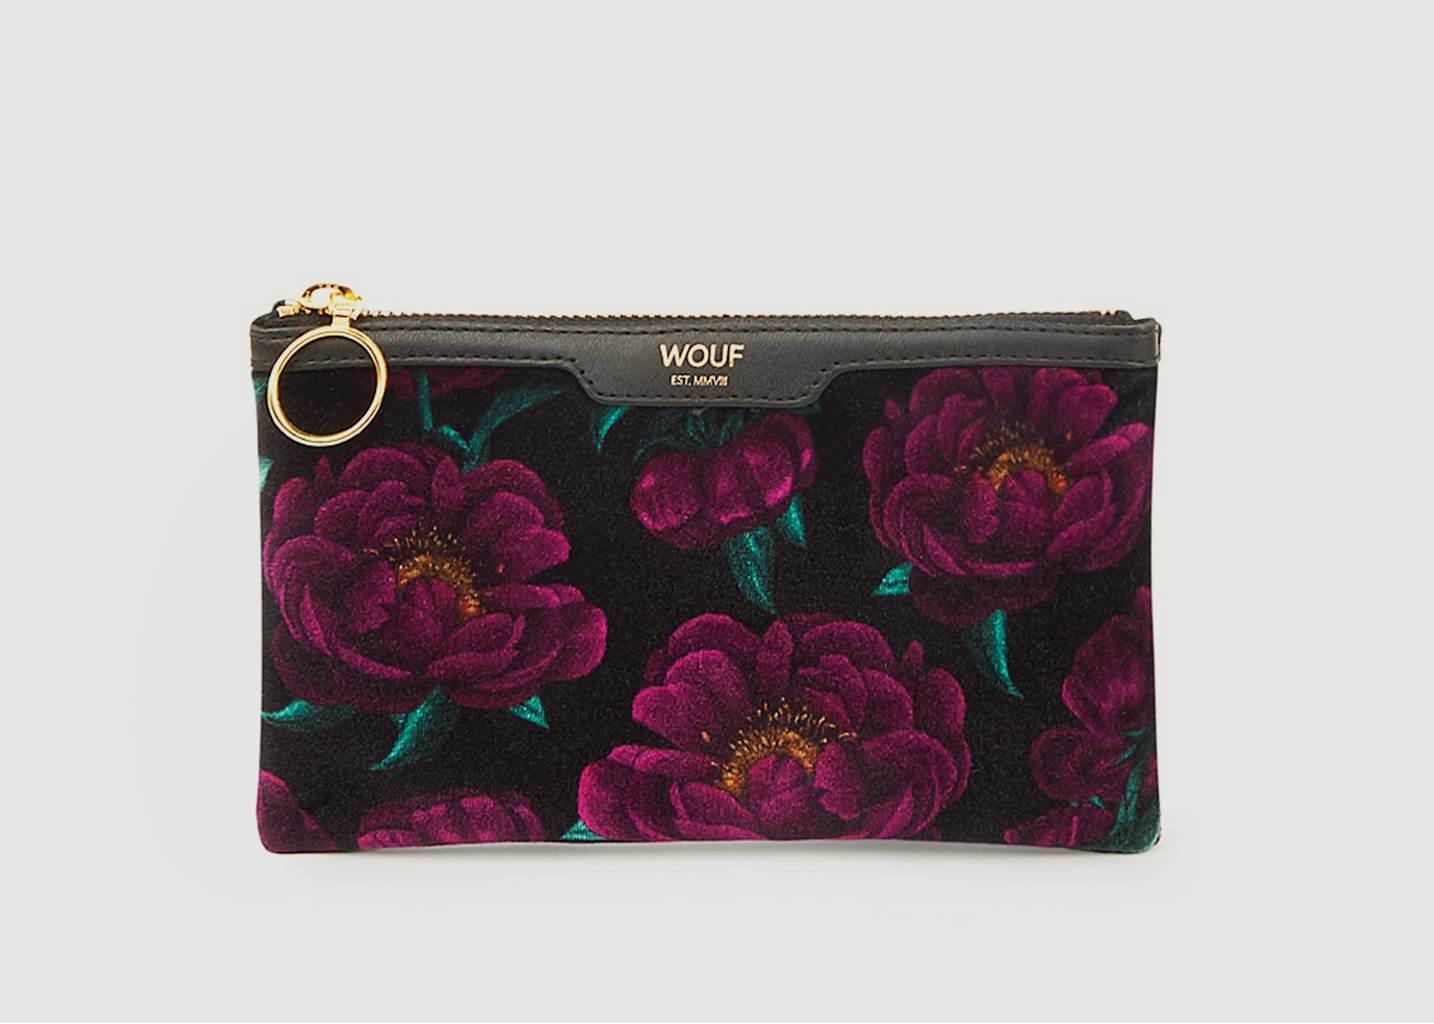 Romance Pocket Clutch - Wouf